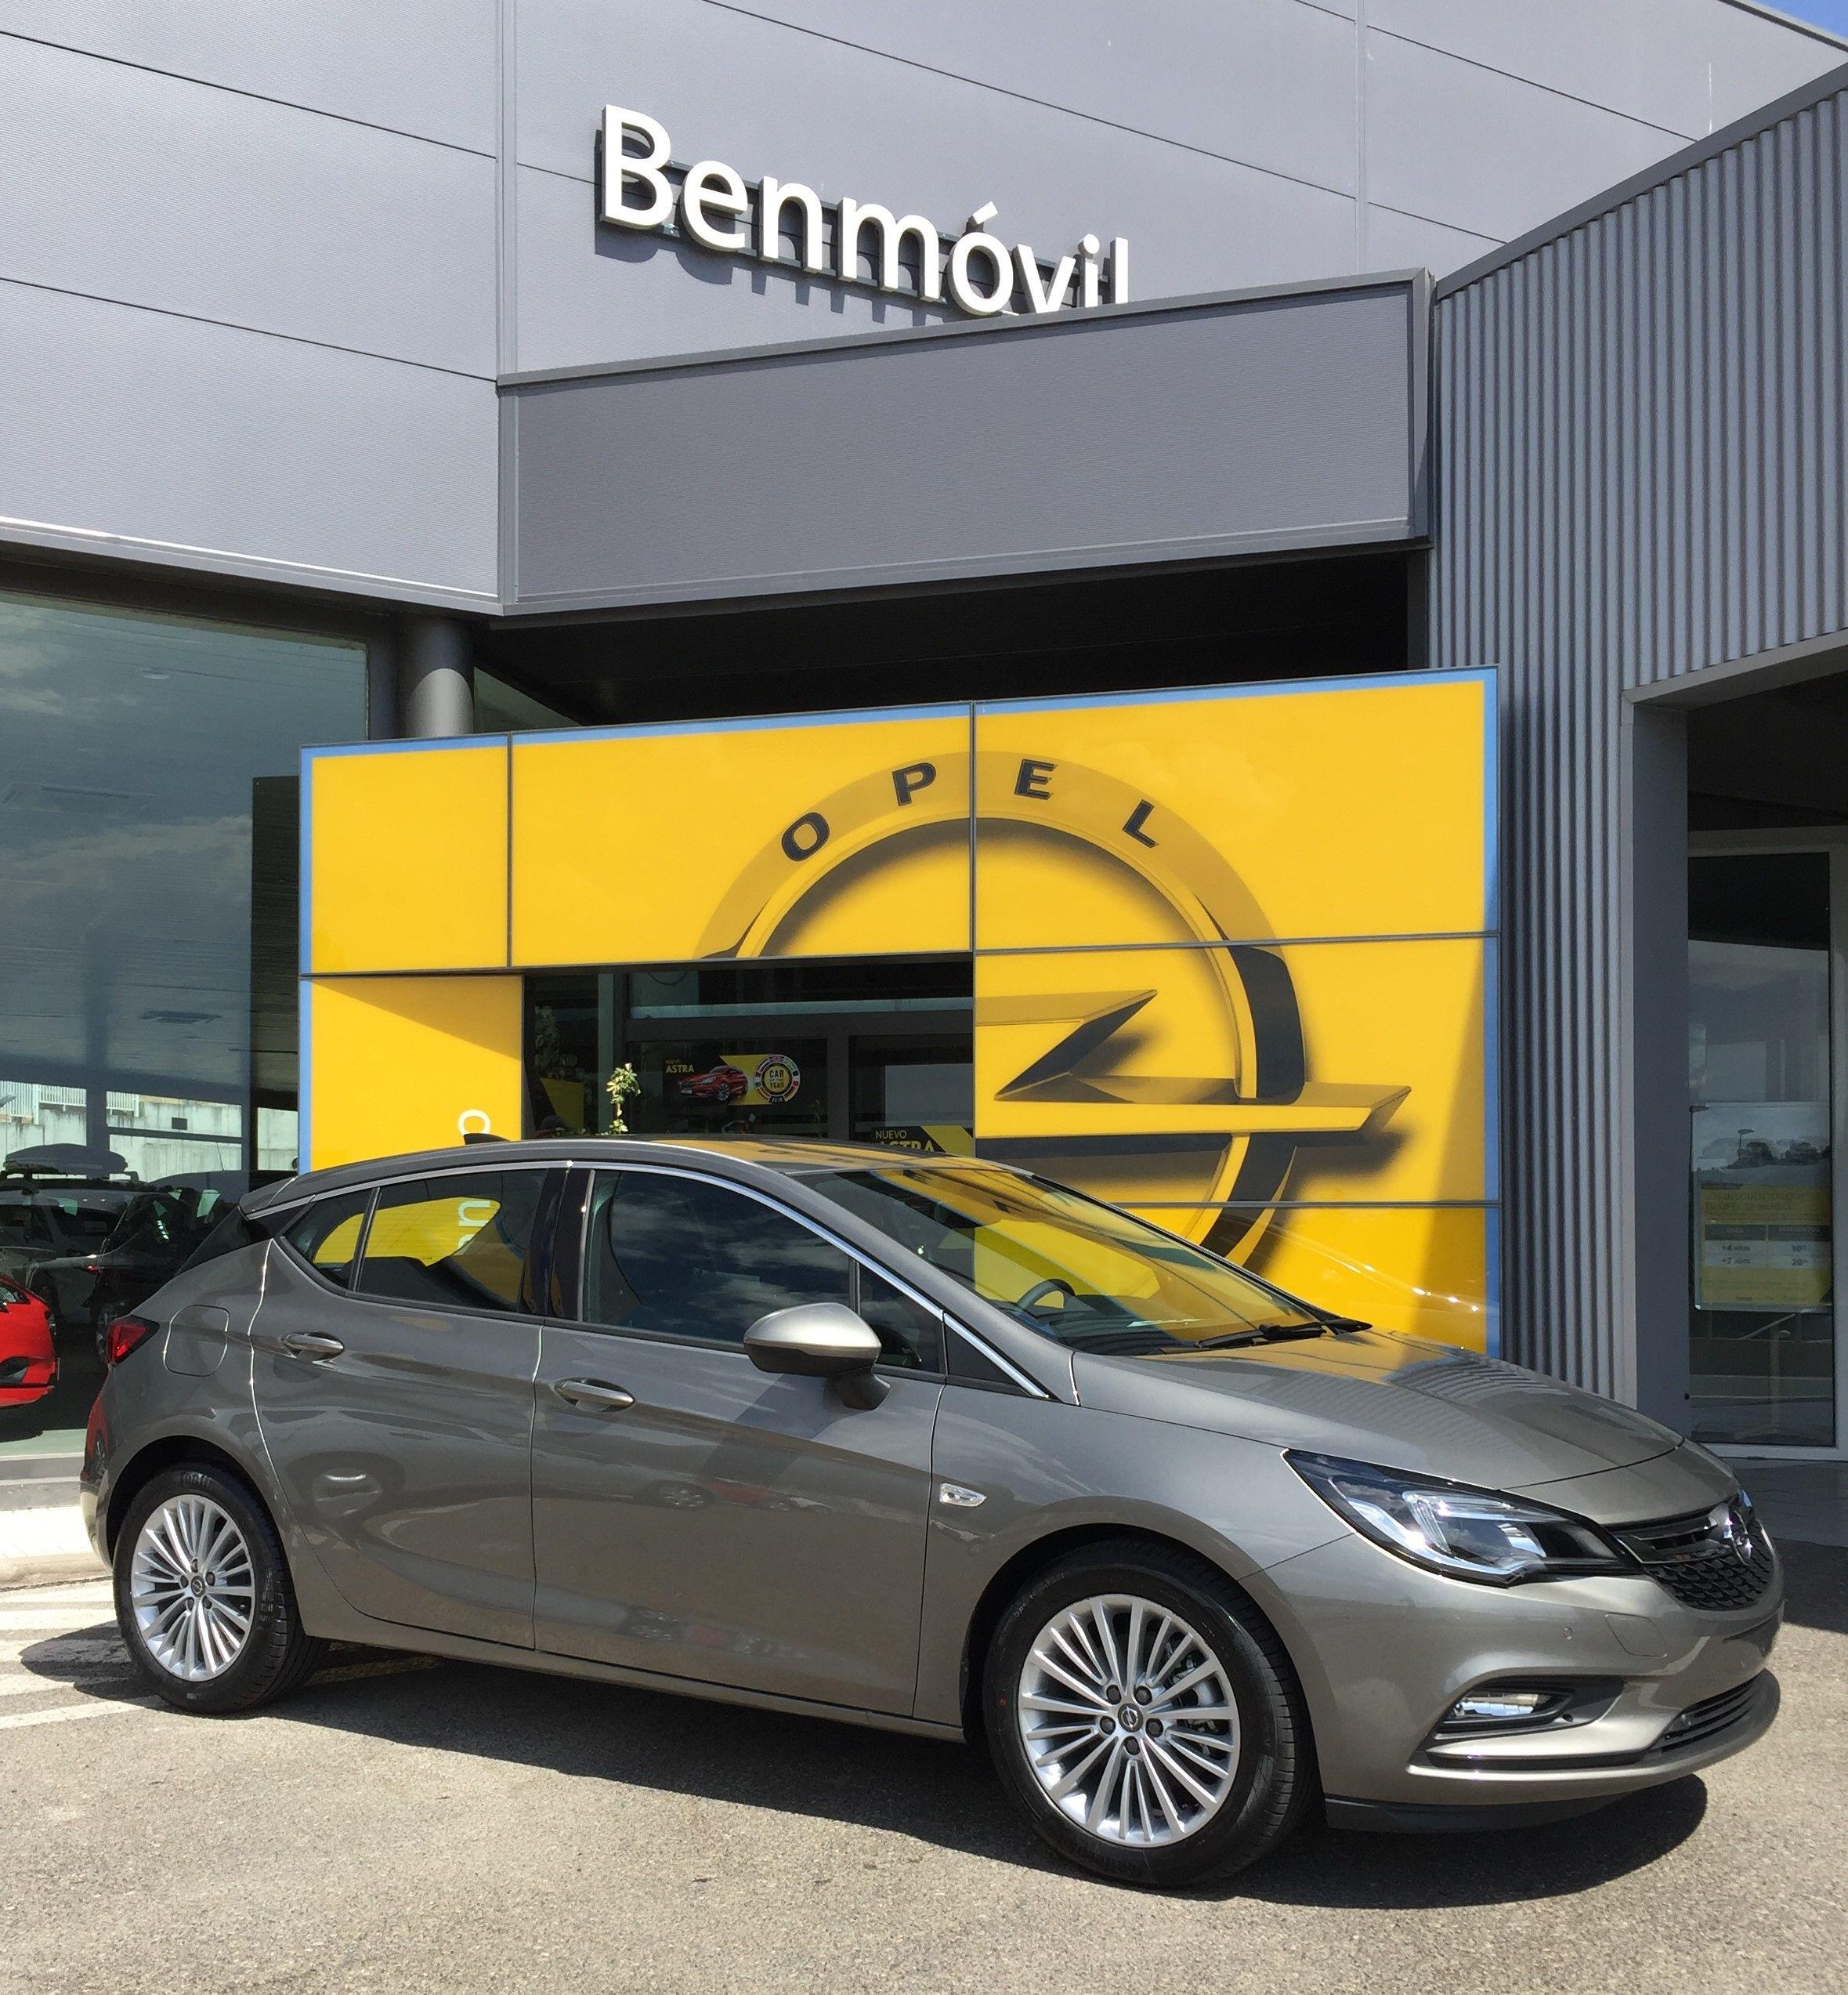 Opel Astra Dynamic 1.6 Cdti 110cv por 190€/mes. NI UN CÉNTIMO MÁS